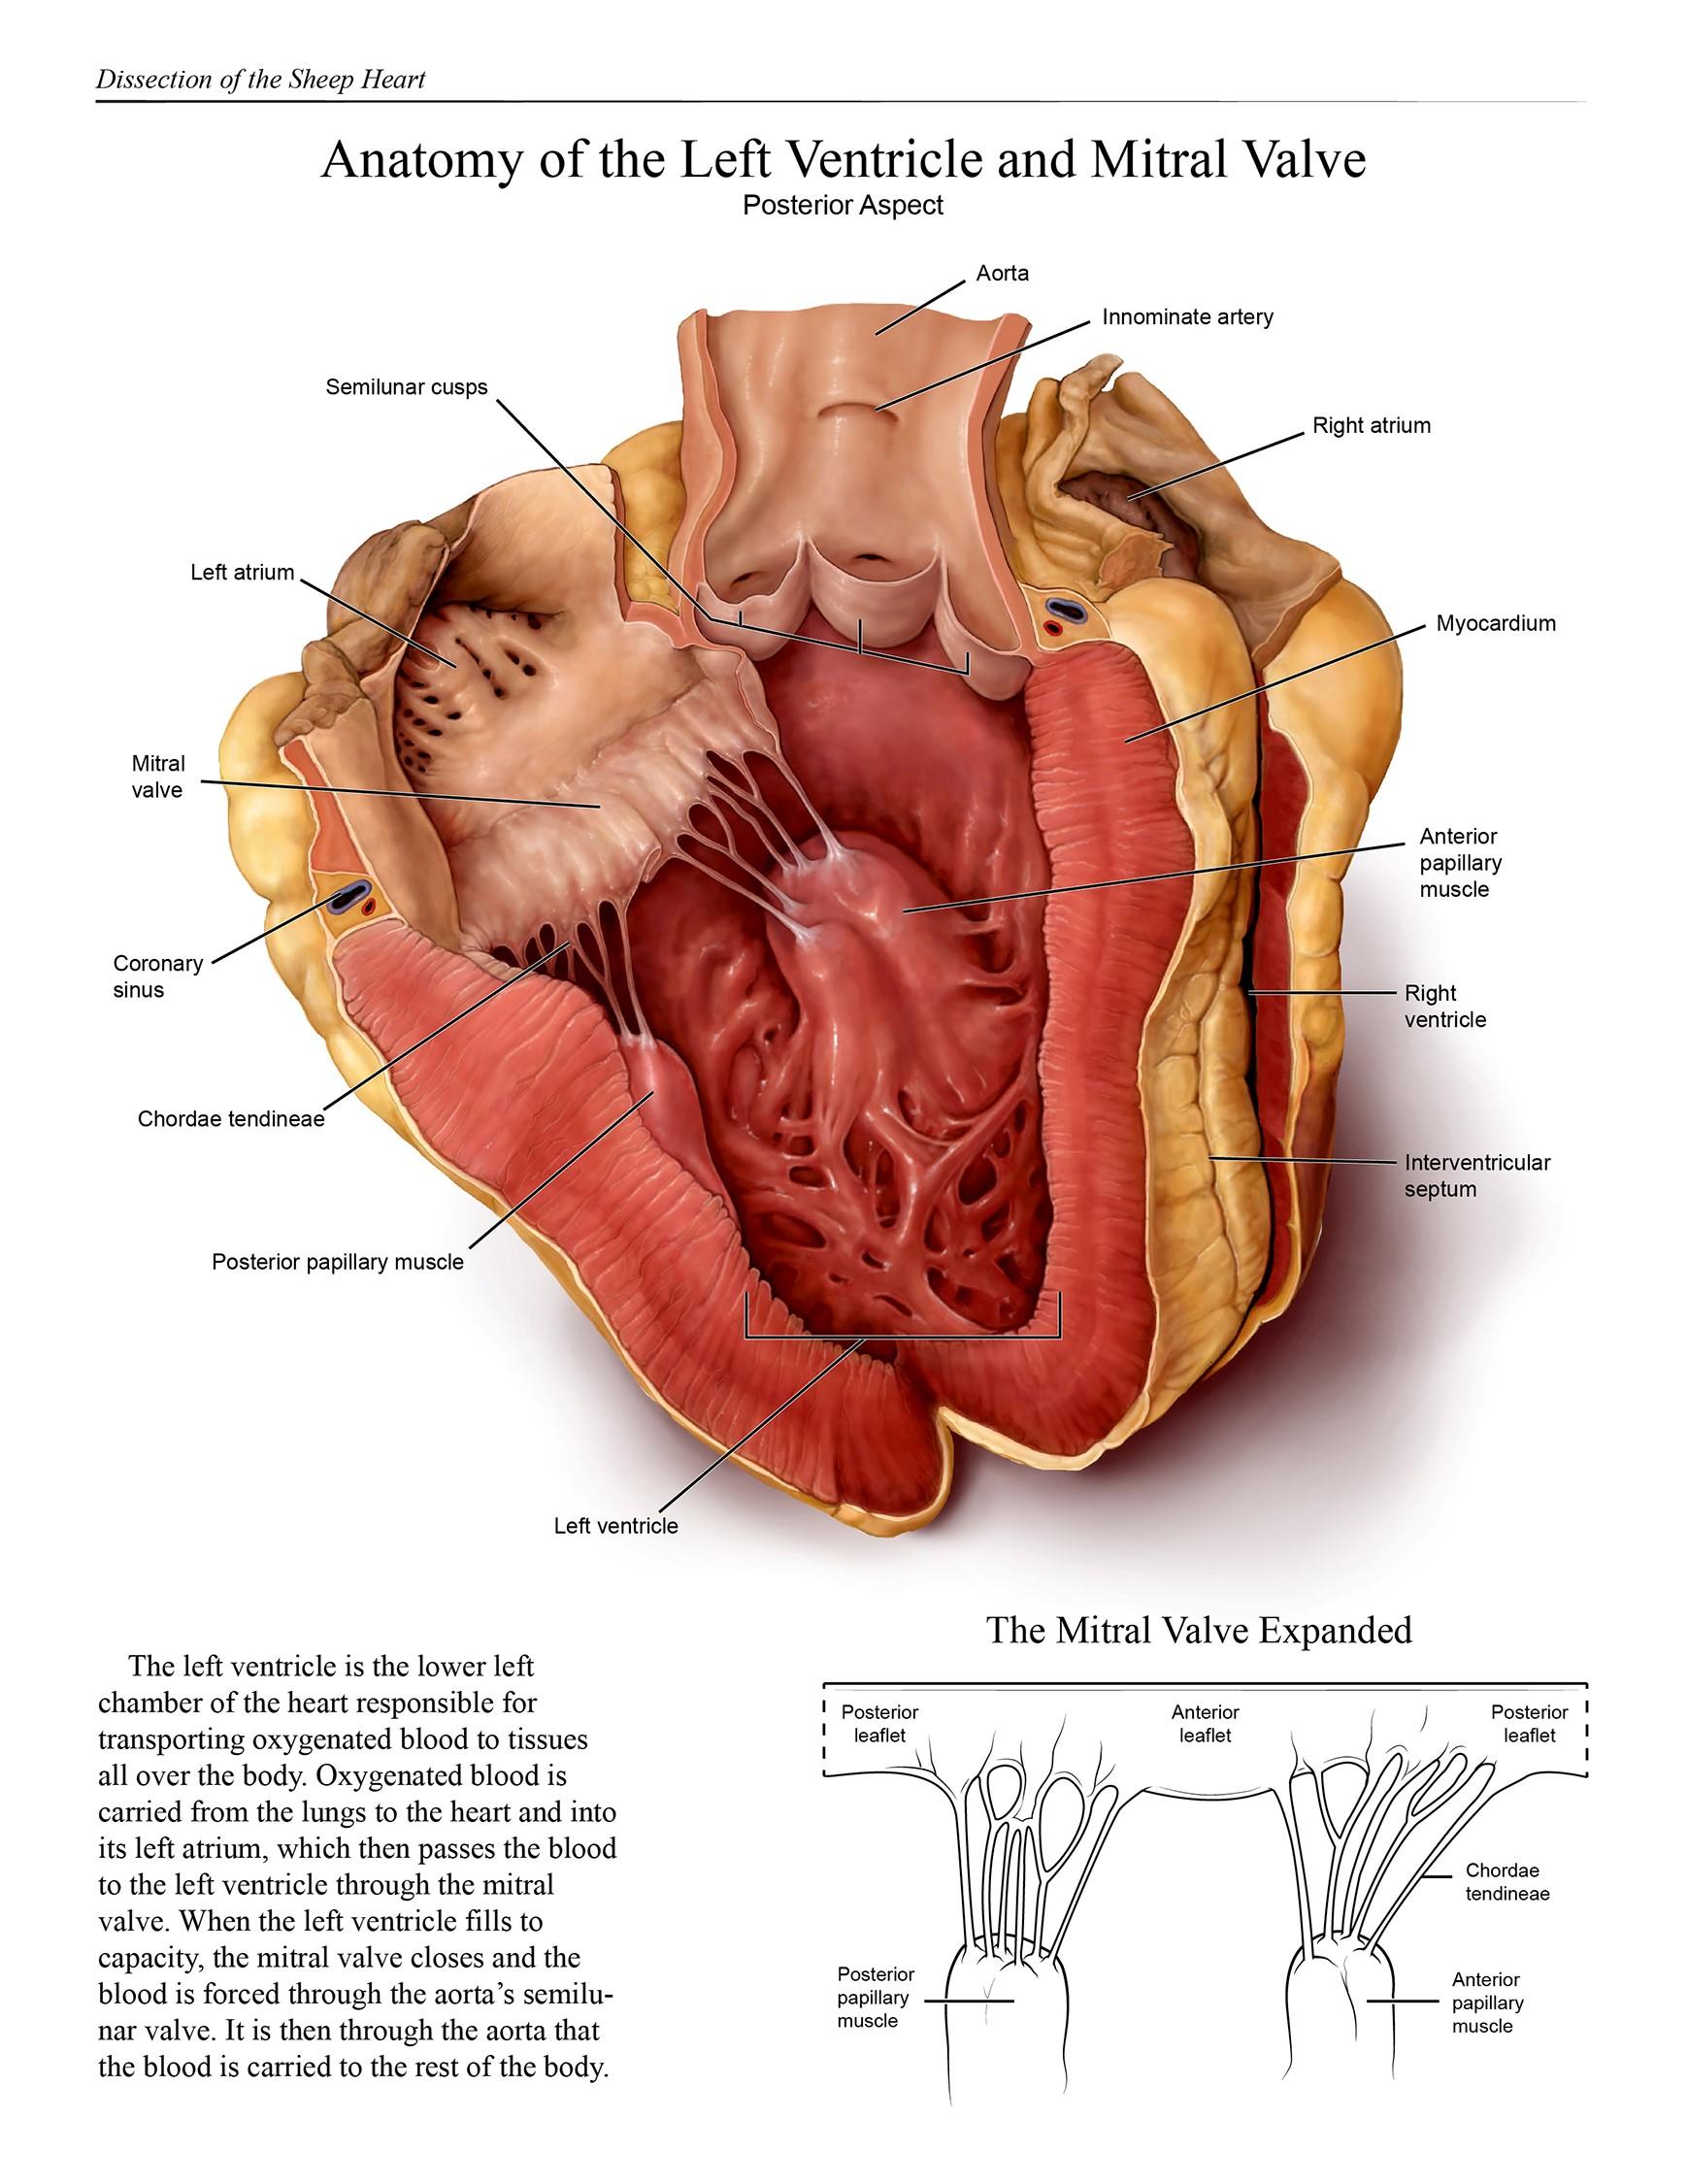 2016 Salon Winners - Association of Medical Illustrators